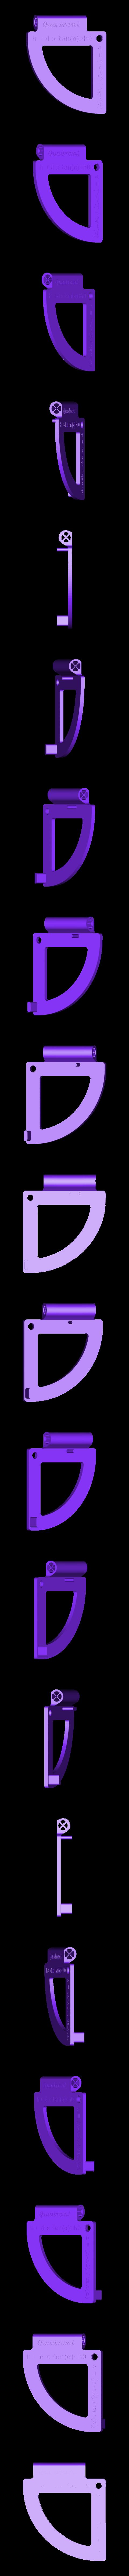 Quadrant_top.stl Download free STL file Quadrant (Sexstant predecessor) - Celestial navigation - NO Supports • 3D printing design, Mirketto